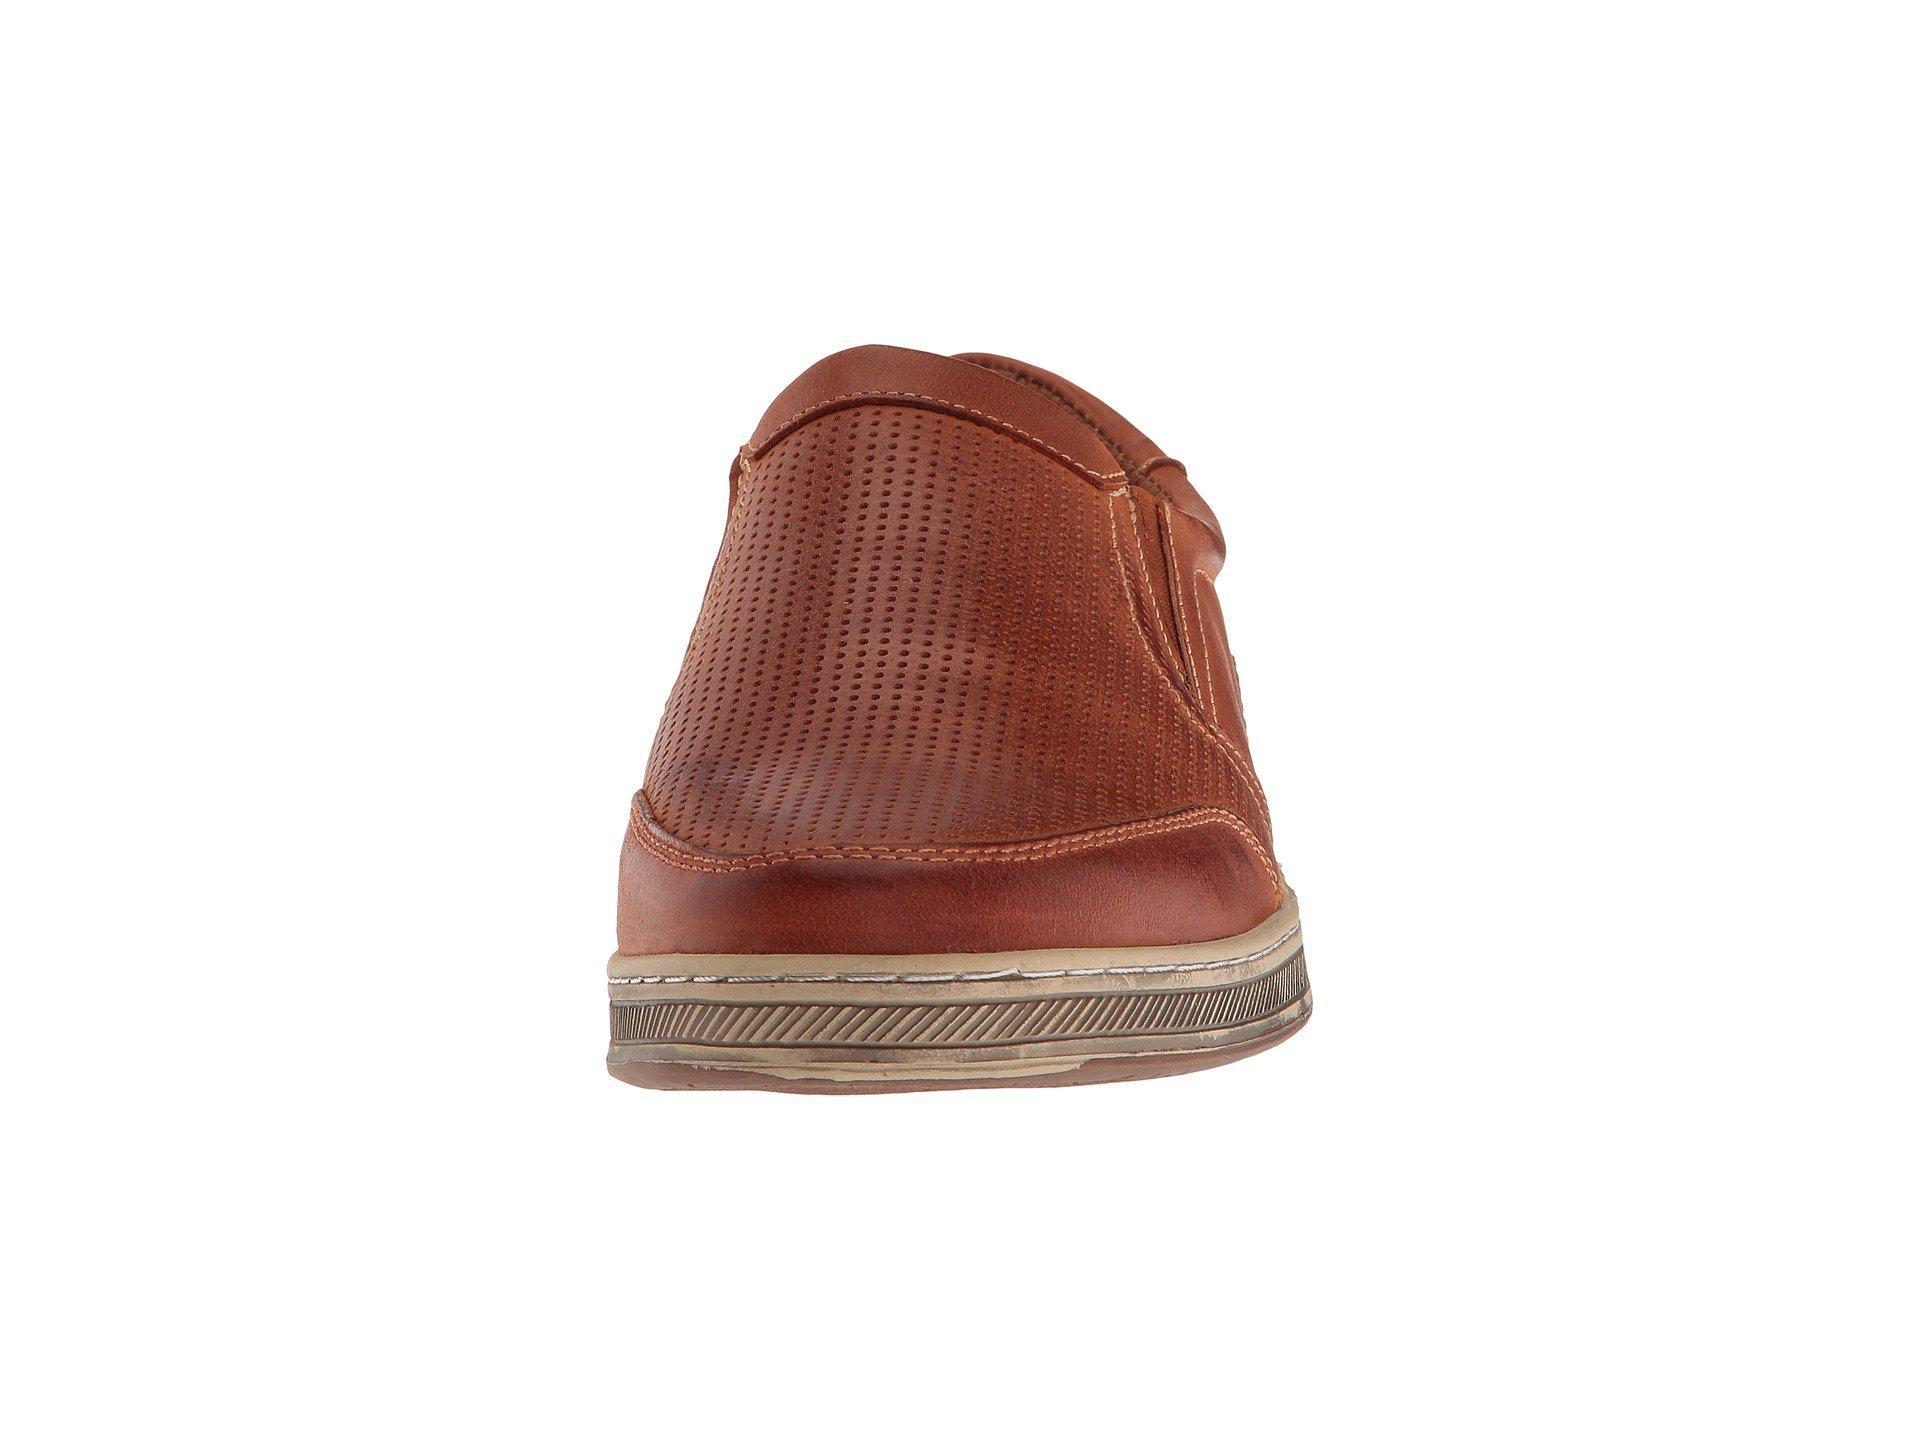 Propet Zane Slip On Shoe(Men's) -Black Leather Geniue Stockist Cheap Online XQOk5bJo